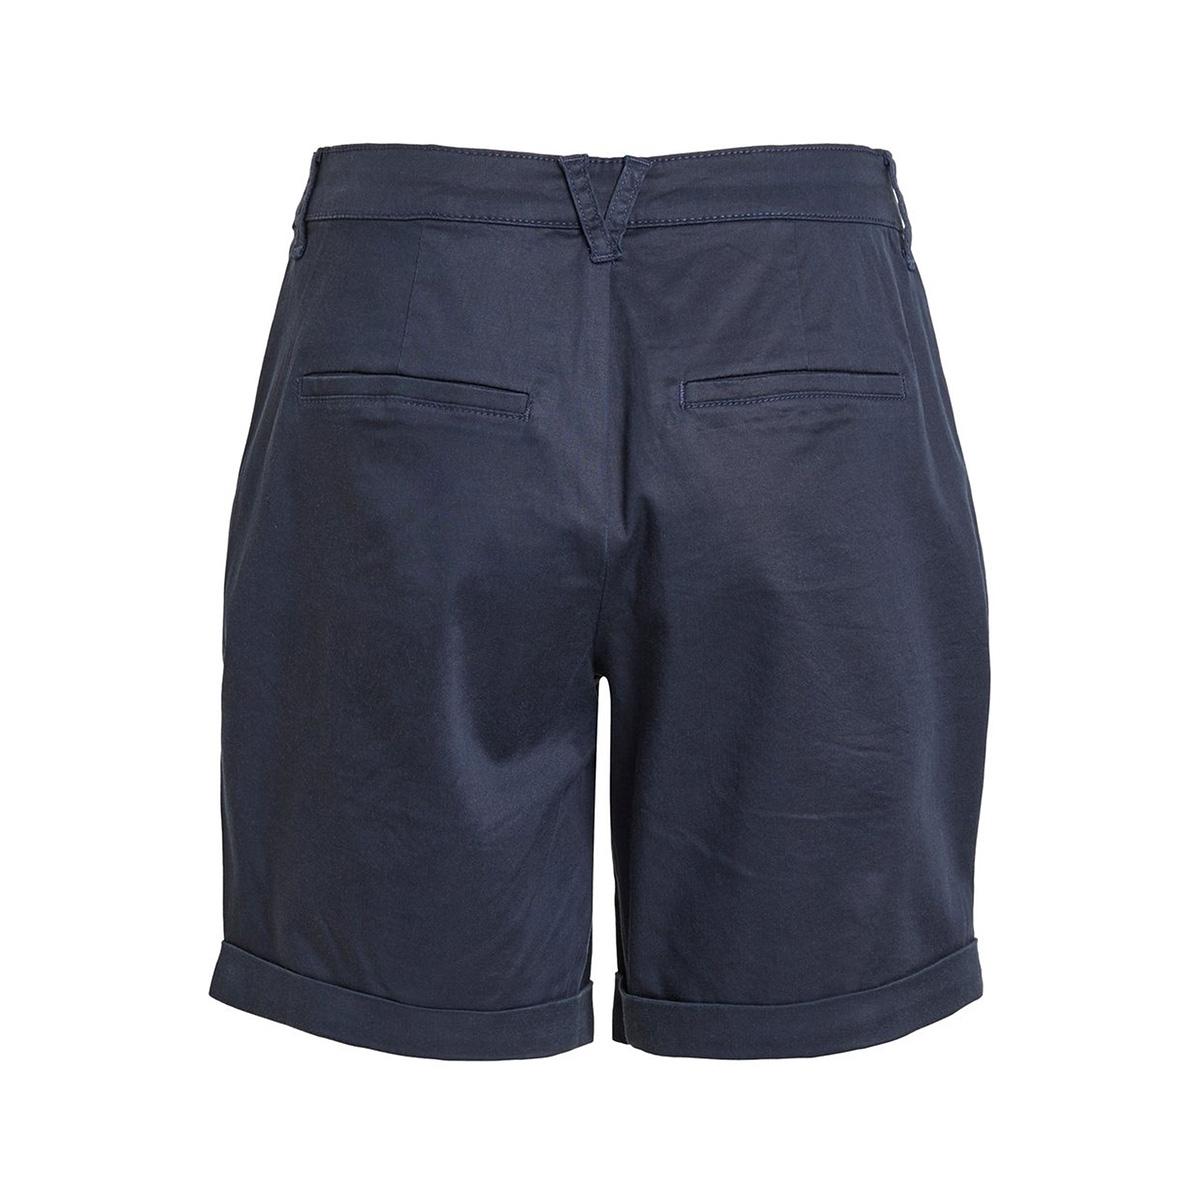 vichino rwre new shorts-noos 14050354 vila korte broek total eclipse